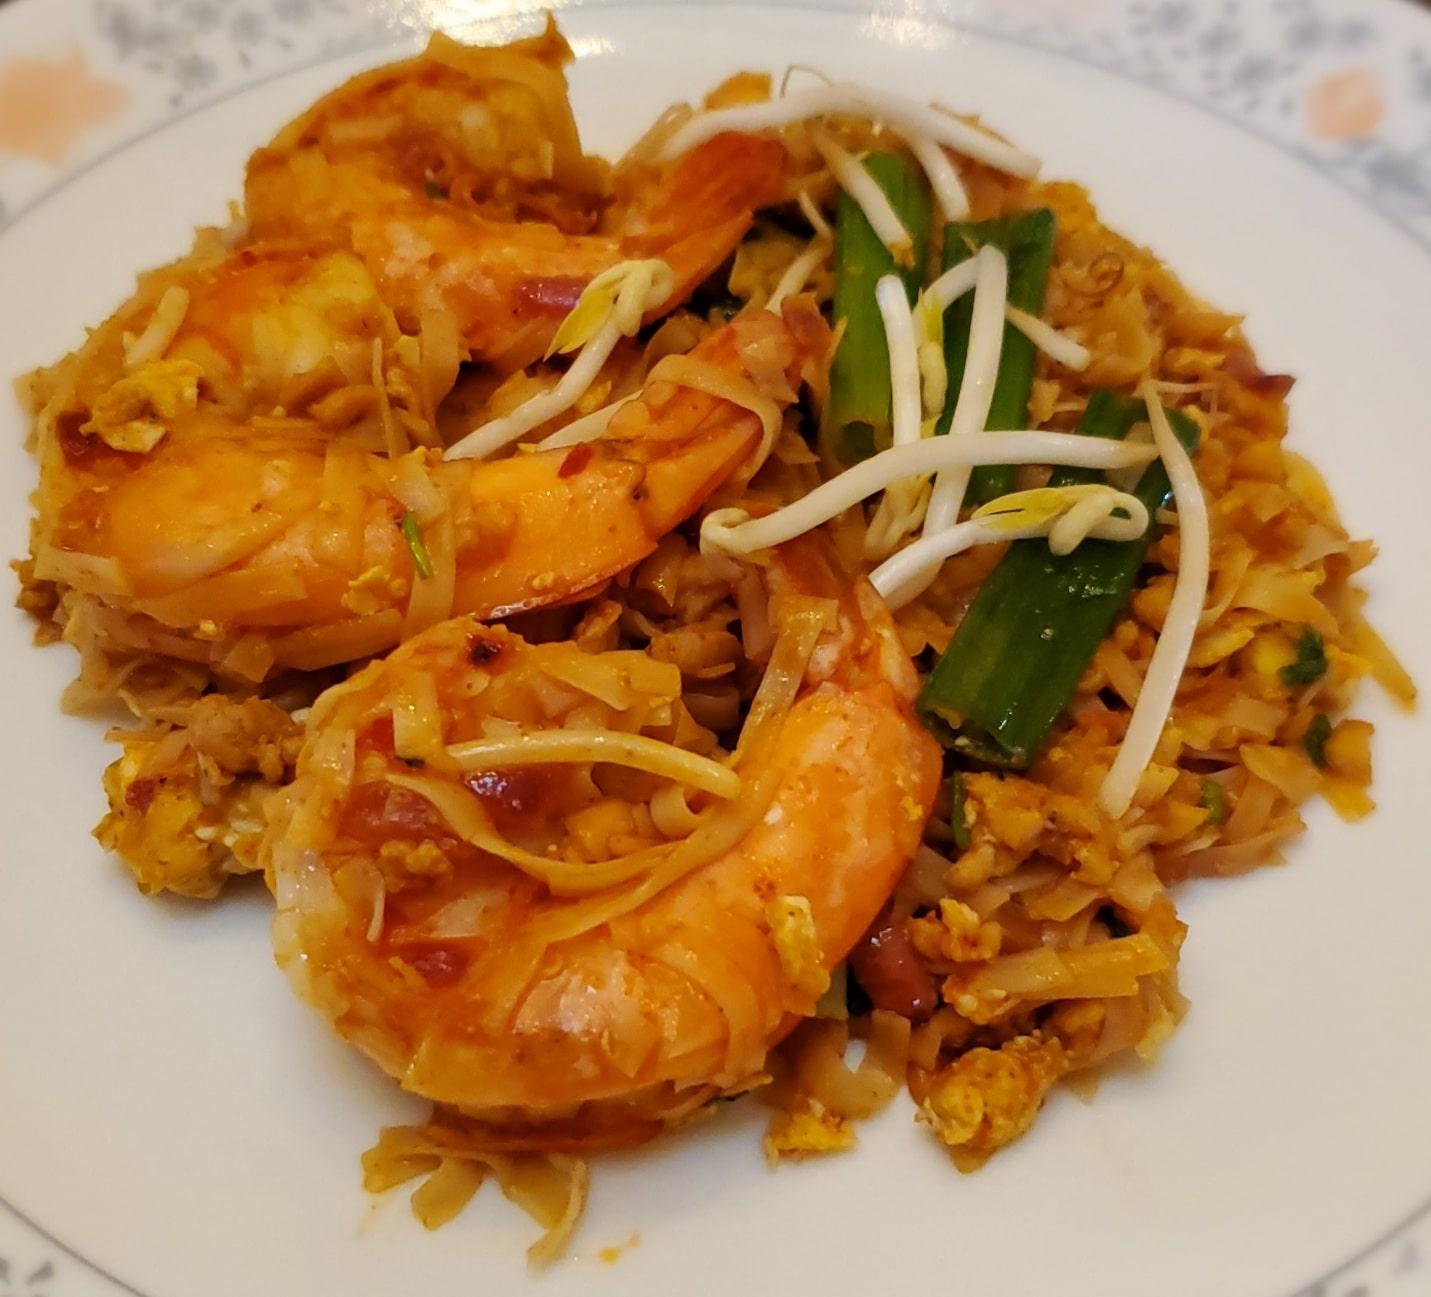 Keto Pad Thai – Shirataki noodles make it possible